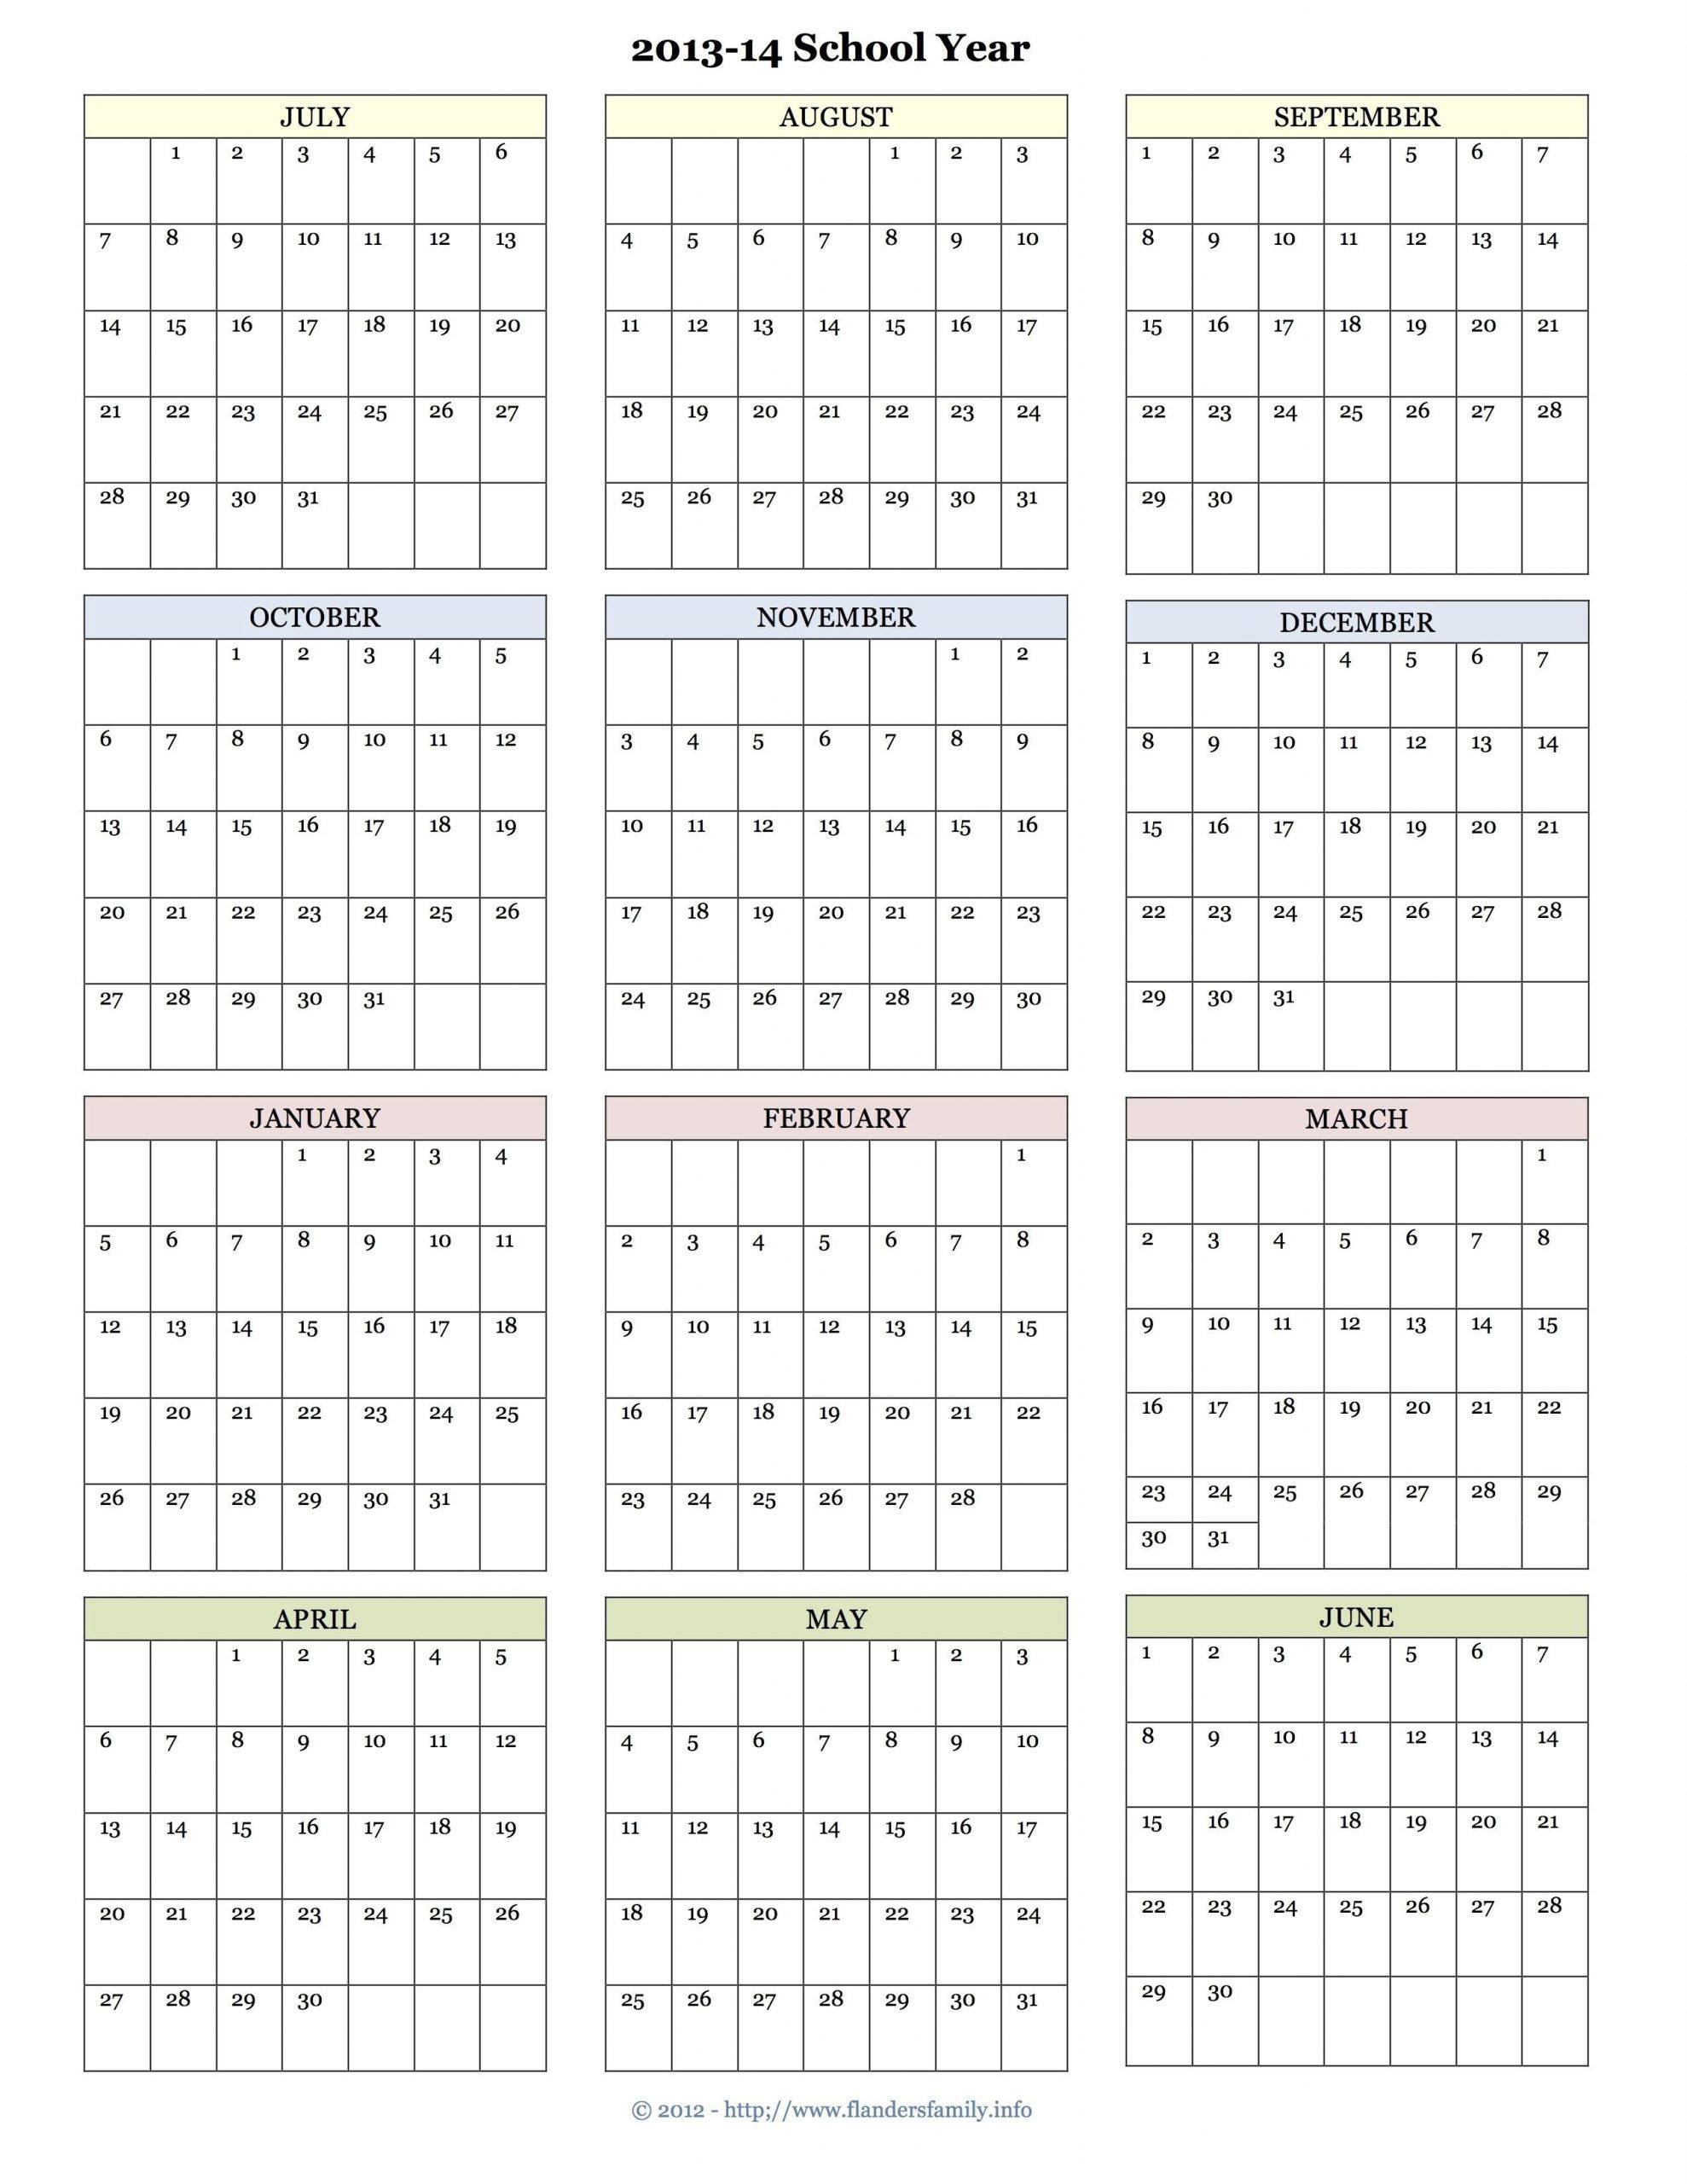 """Depo Provera"" And ""Printable Calendar"" And 2021 pertaining to Depo Calendar For 2021"